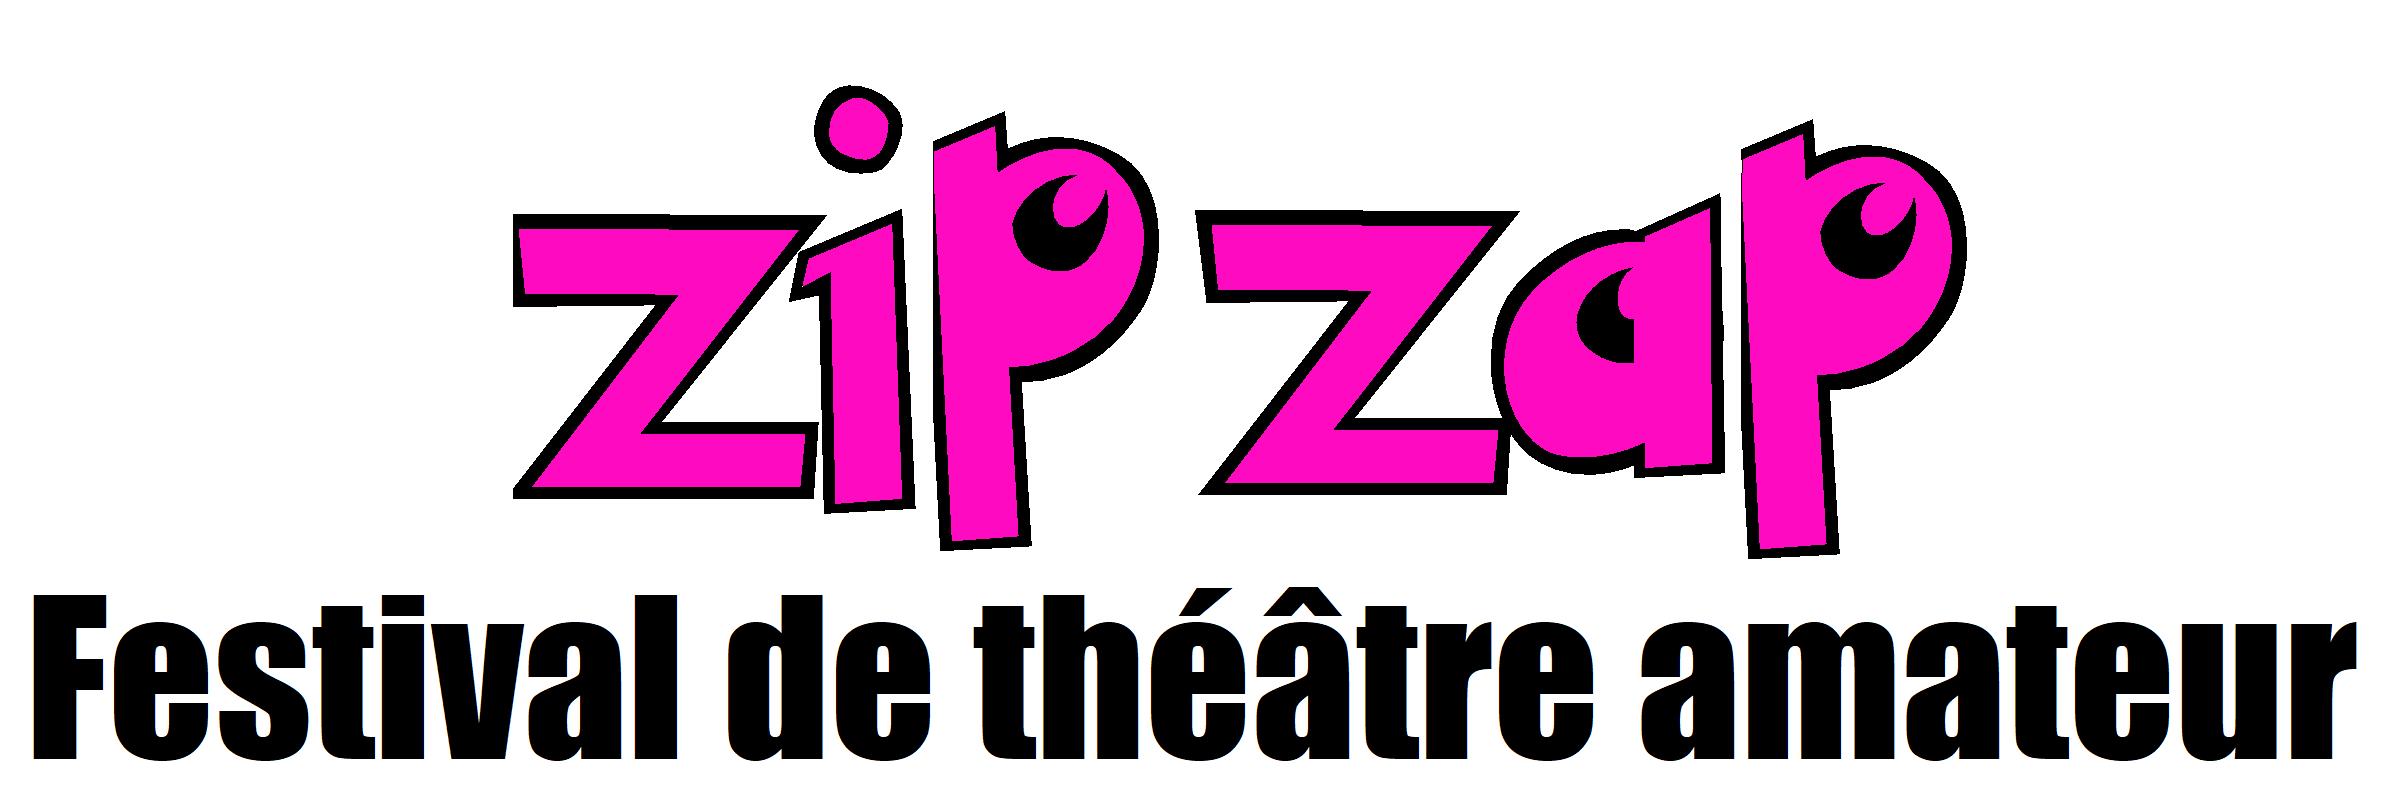 Festivalzipzap Logo